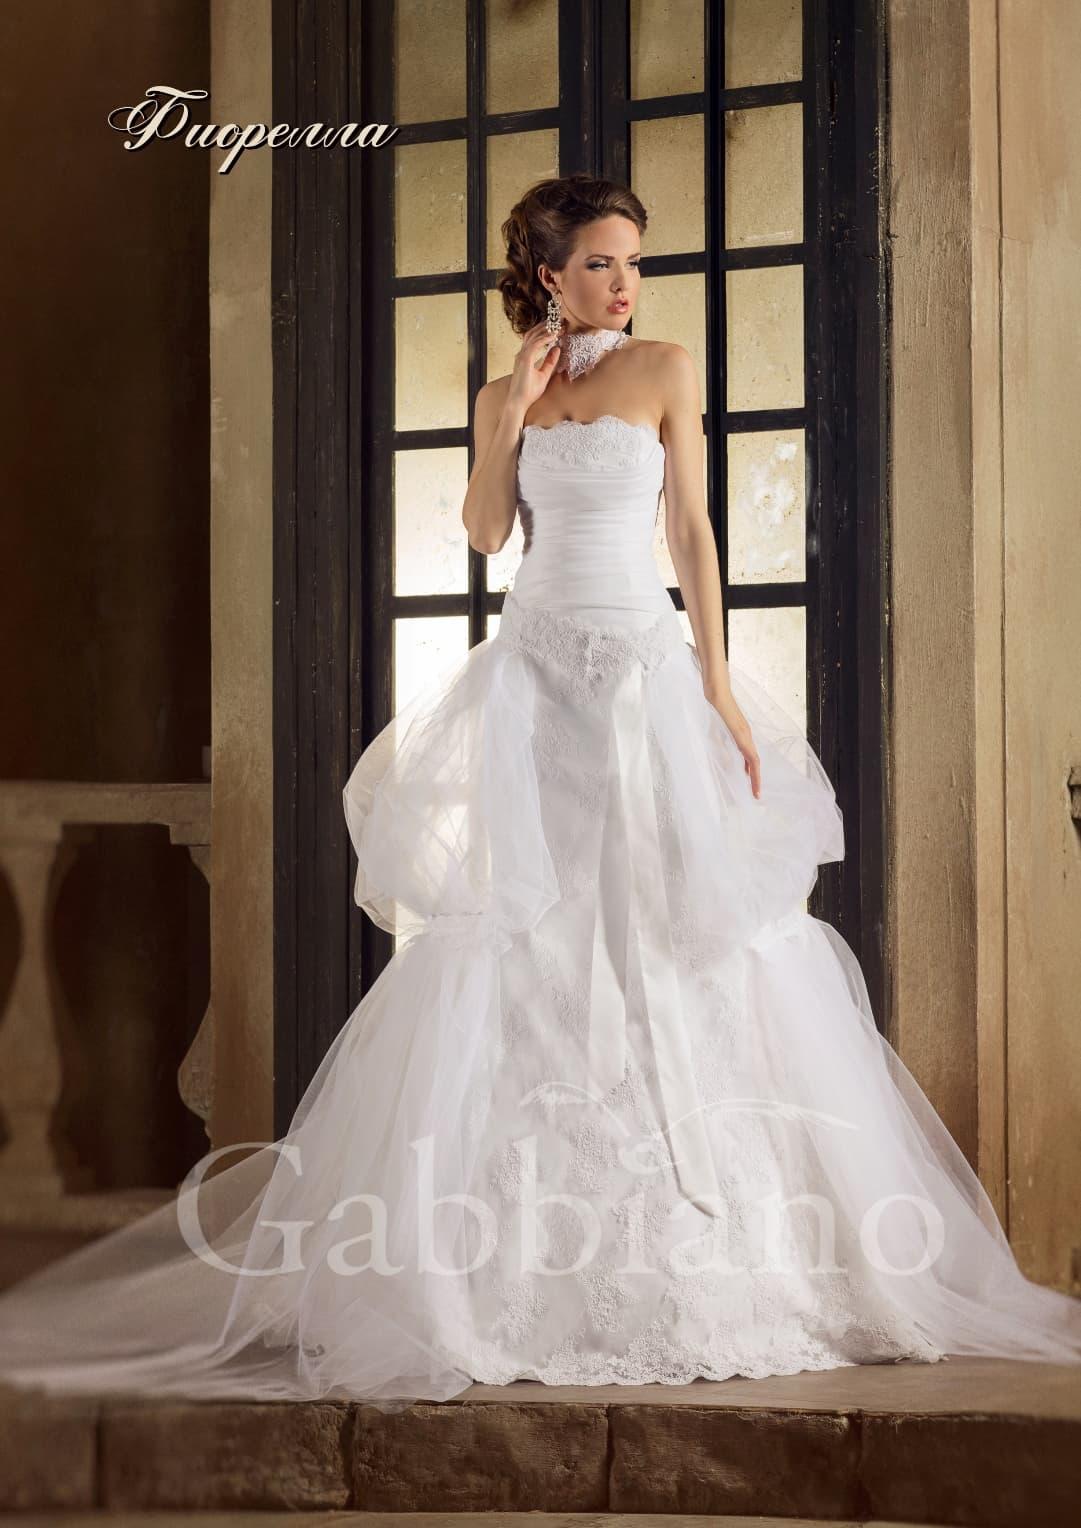 Sonesta Sigourney | Свадебный салон Валенсия